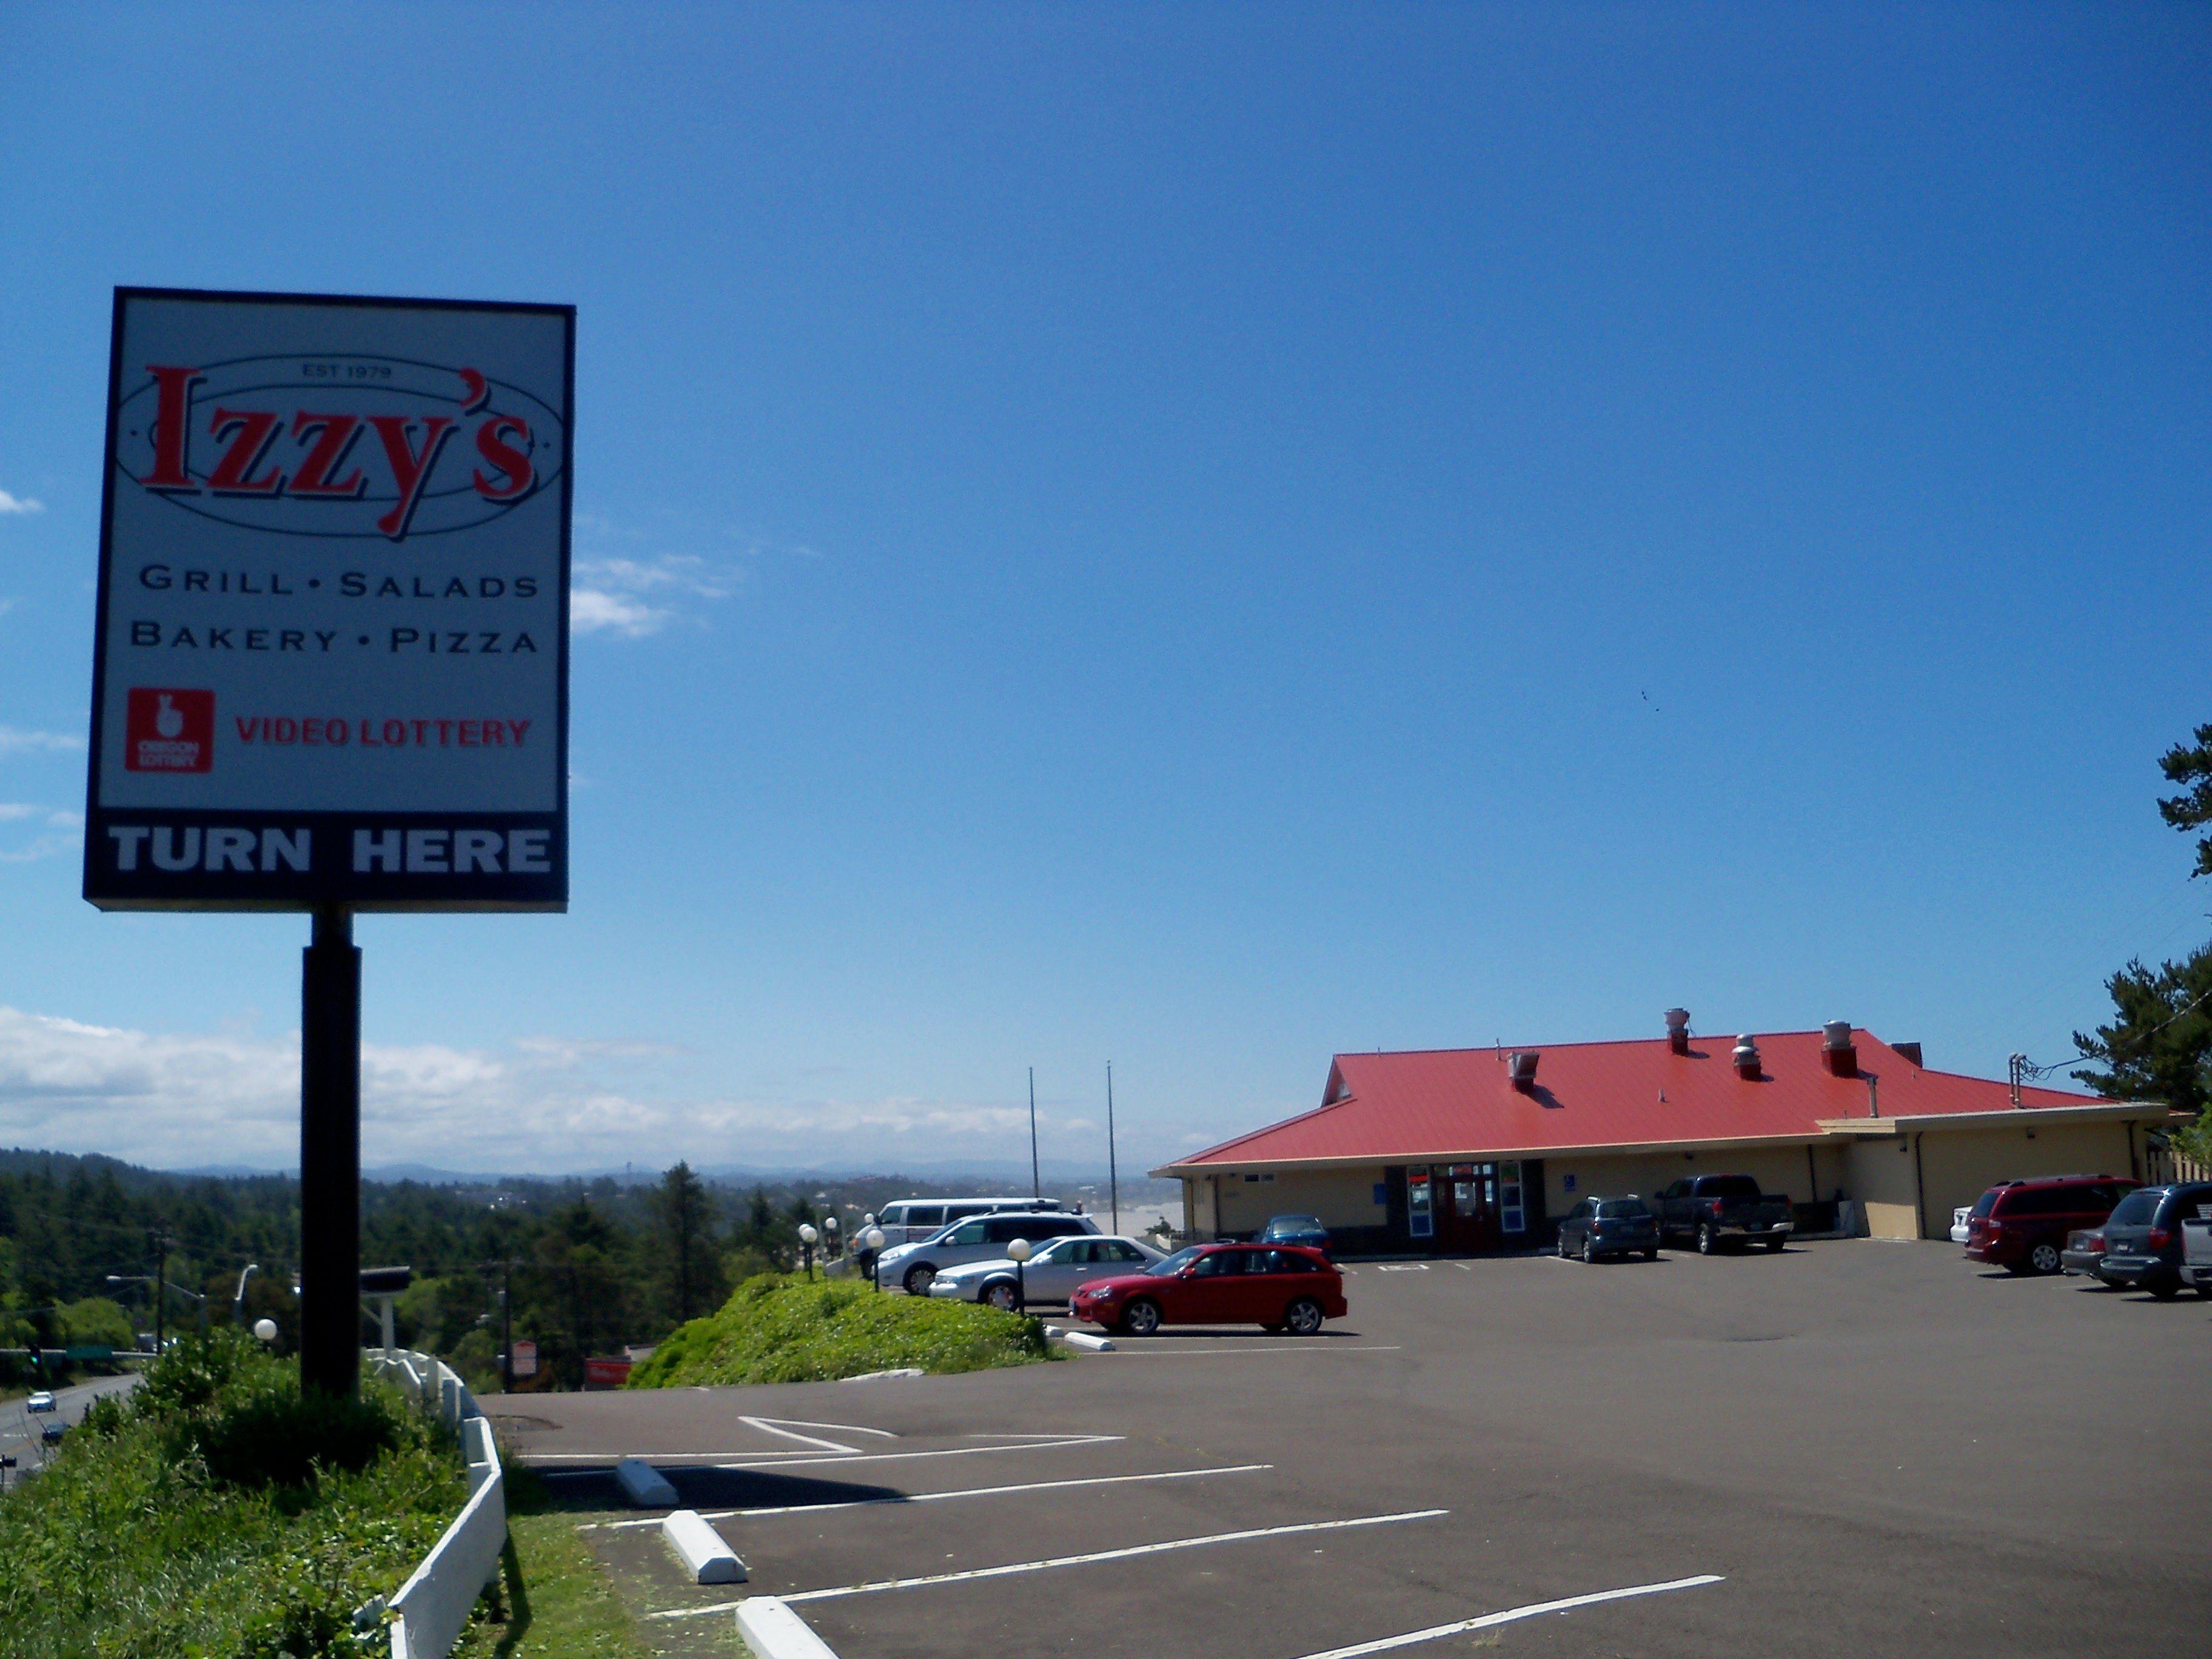 Izzyu0027s Pizza Smorgasbord in Newport Oregon wwworegonbeachvacationscom